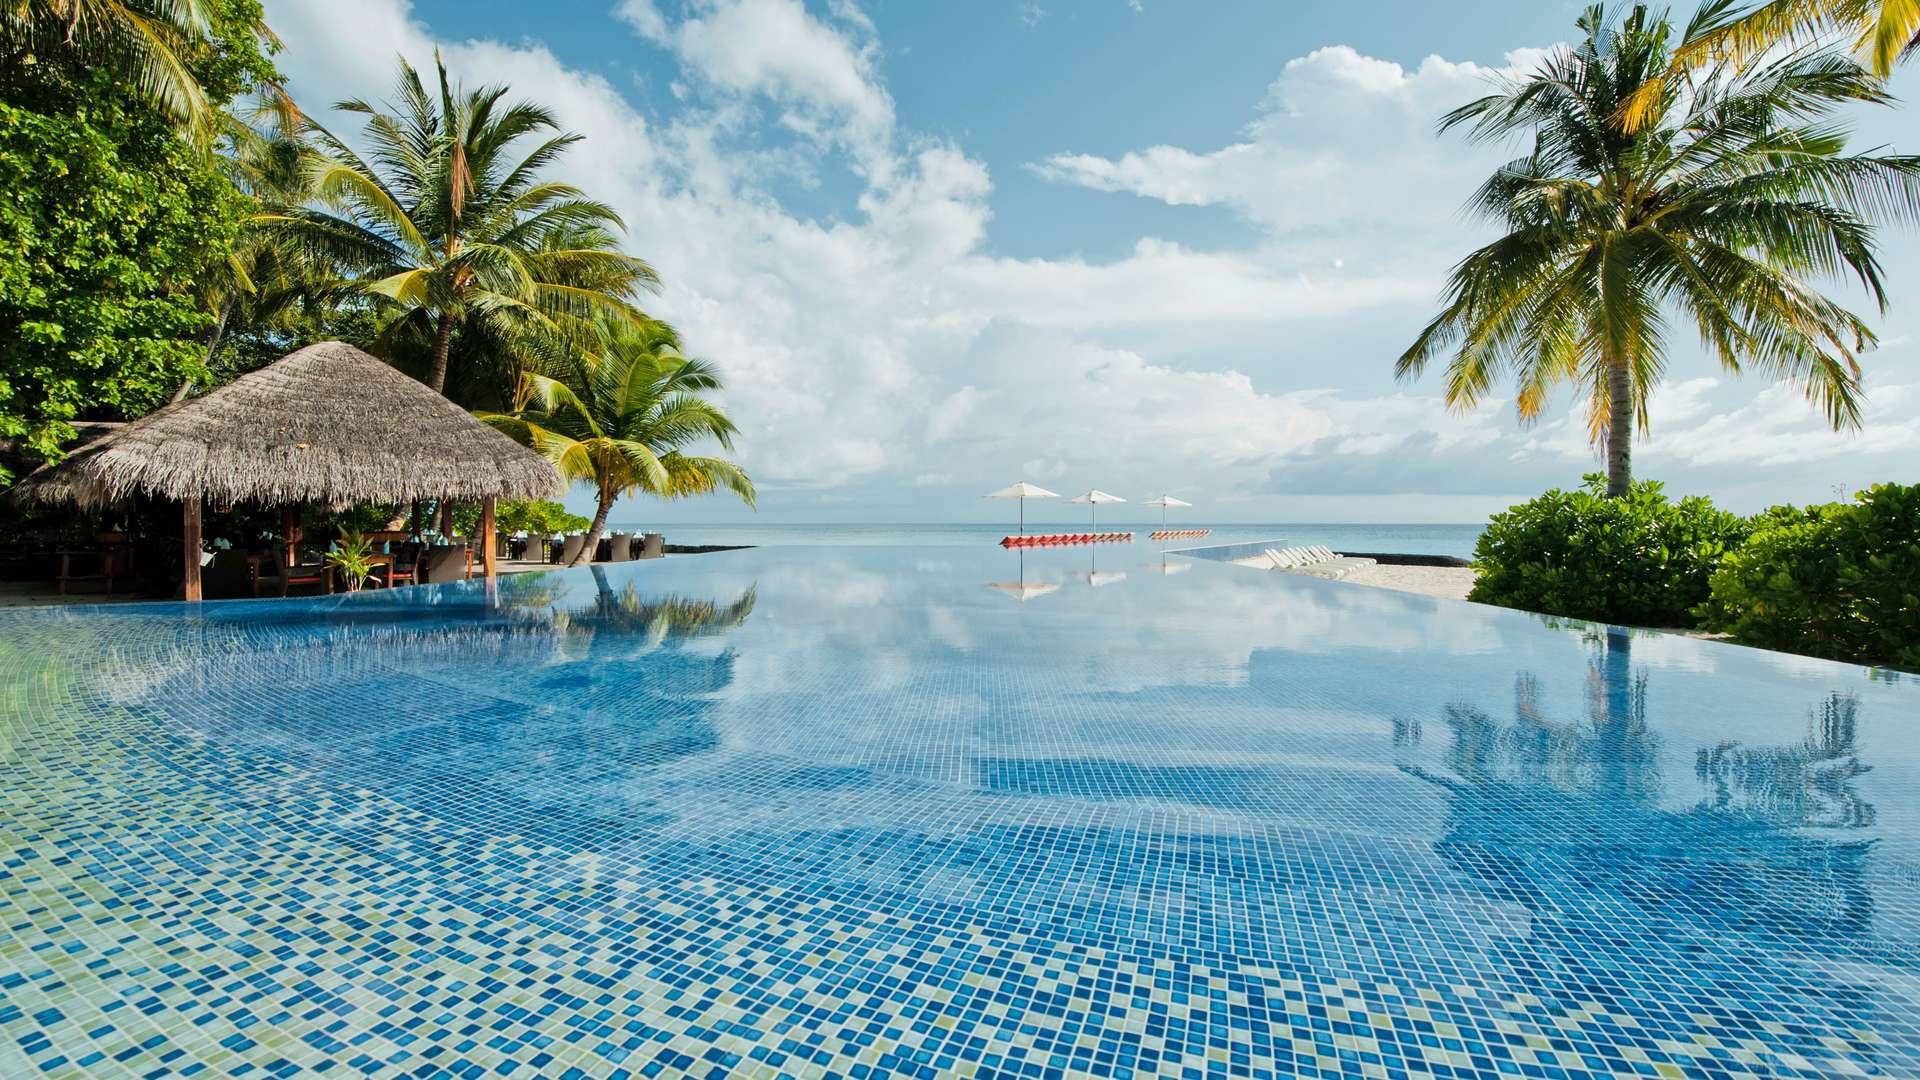 Infinity pool at Kuramathi Maldives